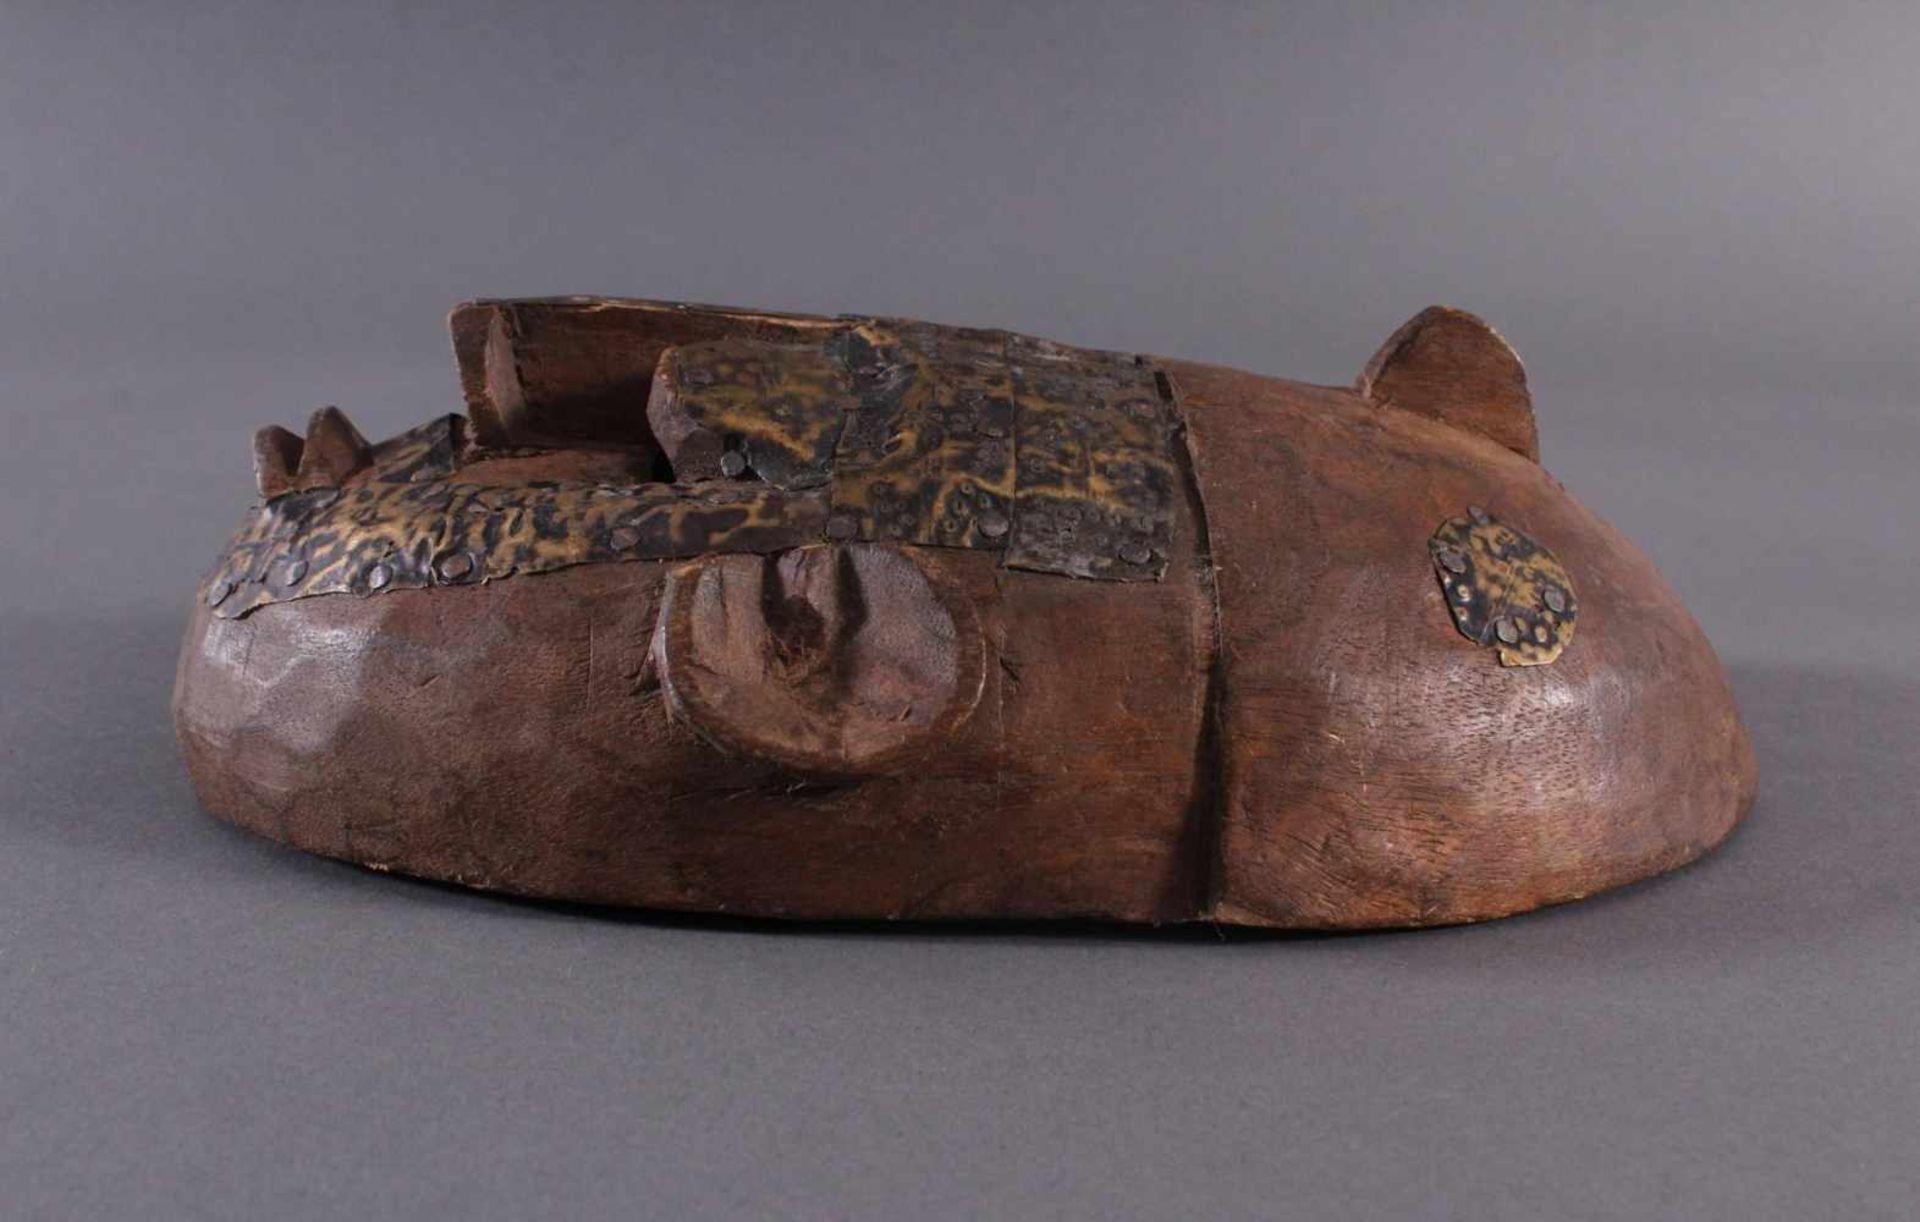 Antike Maske, Marka, Mali 1.Hälfte 19. Jh.Holz geschnitzt, Gesicht stzellenweise mit Messing-Blech - Bild 5 aus 6